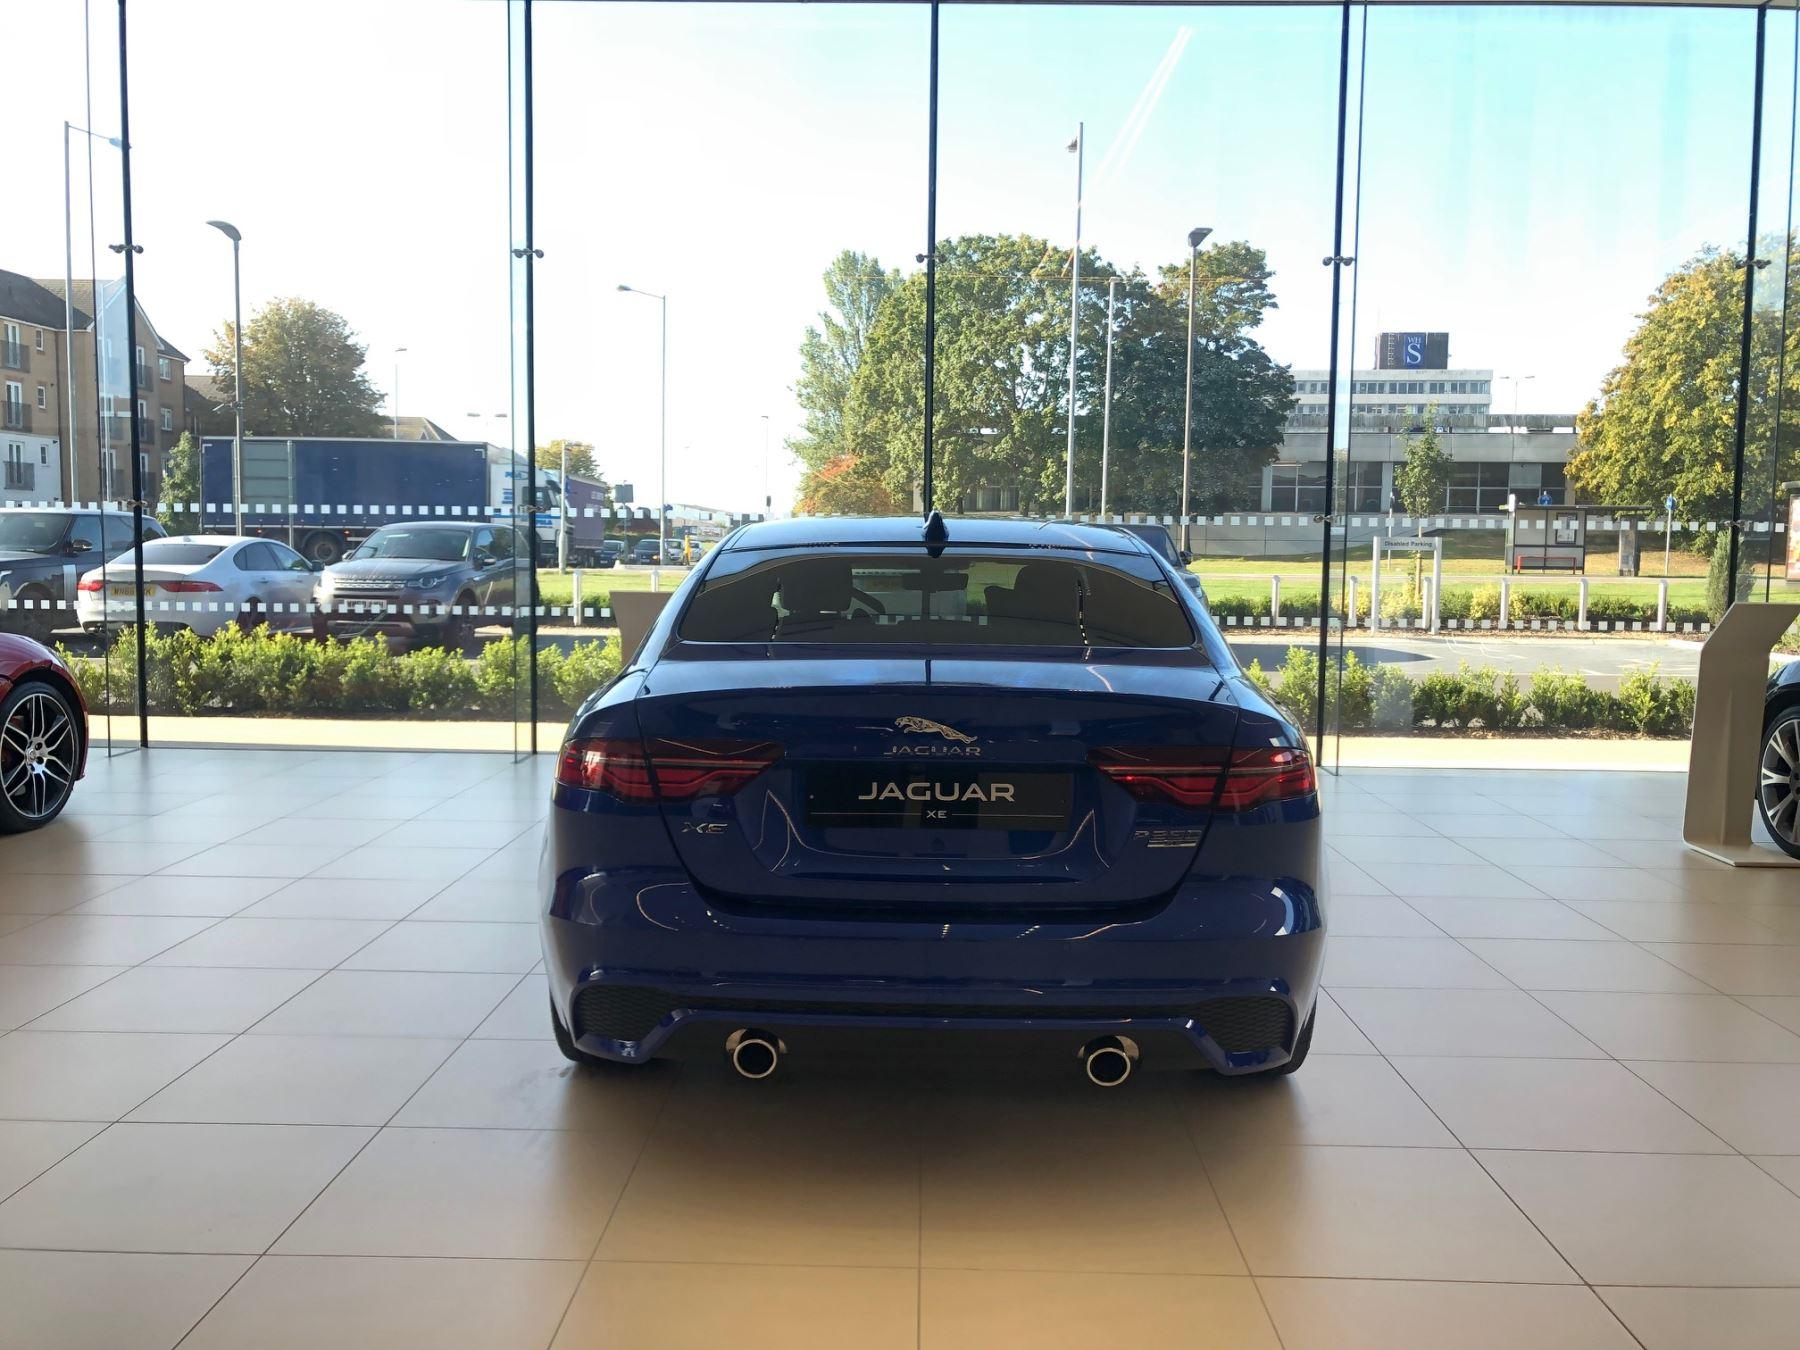 Jaguar XE 2.0 R-Dynamic SE image 5